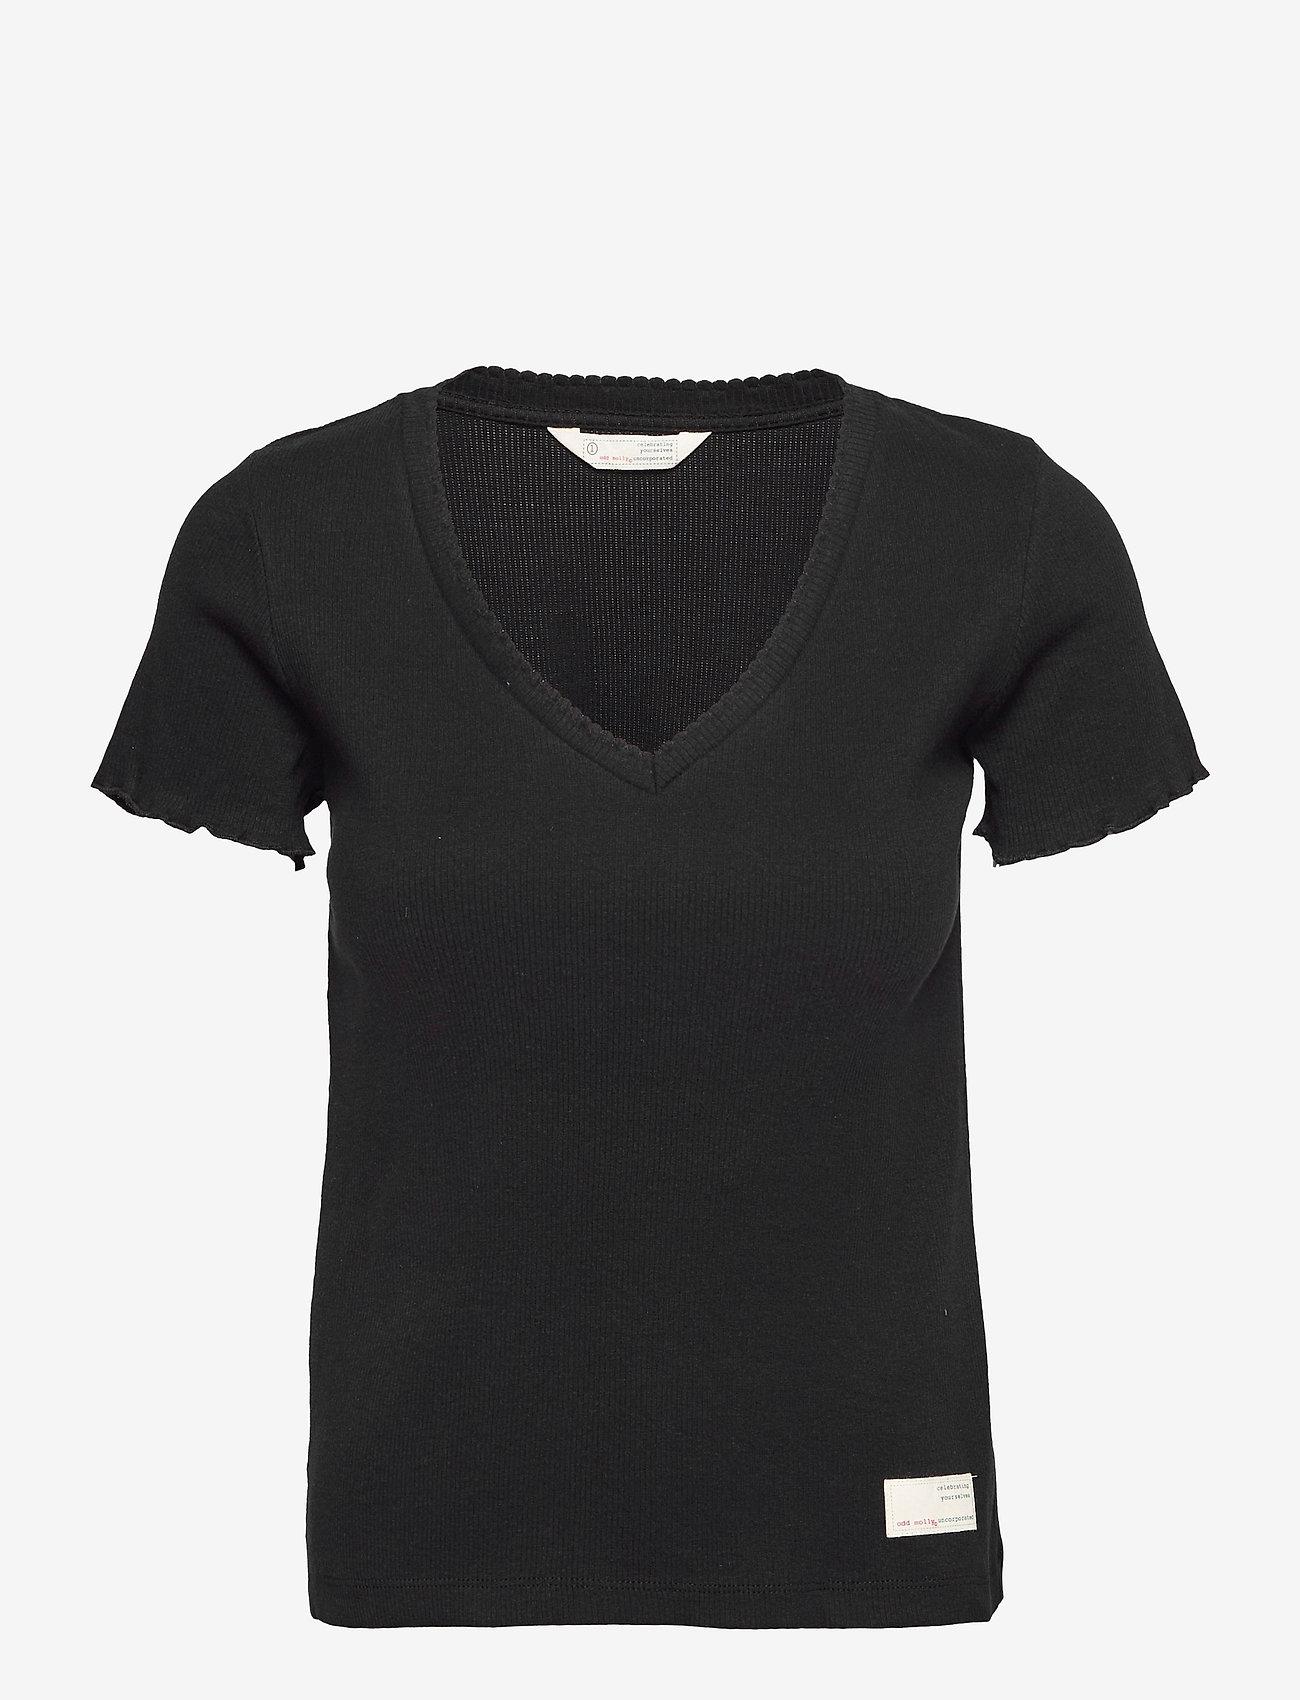 ODD MOLLY - Lynda Top - t-shirts - almost black - 1